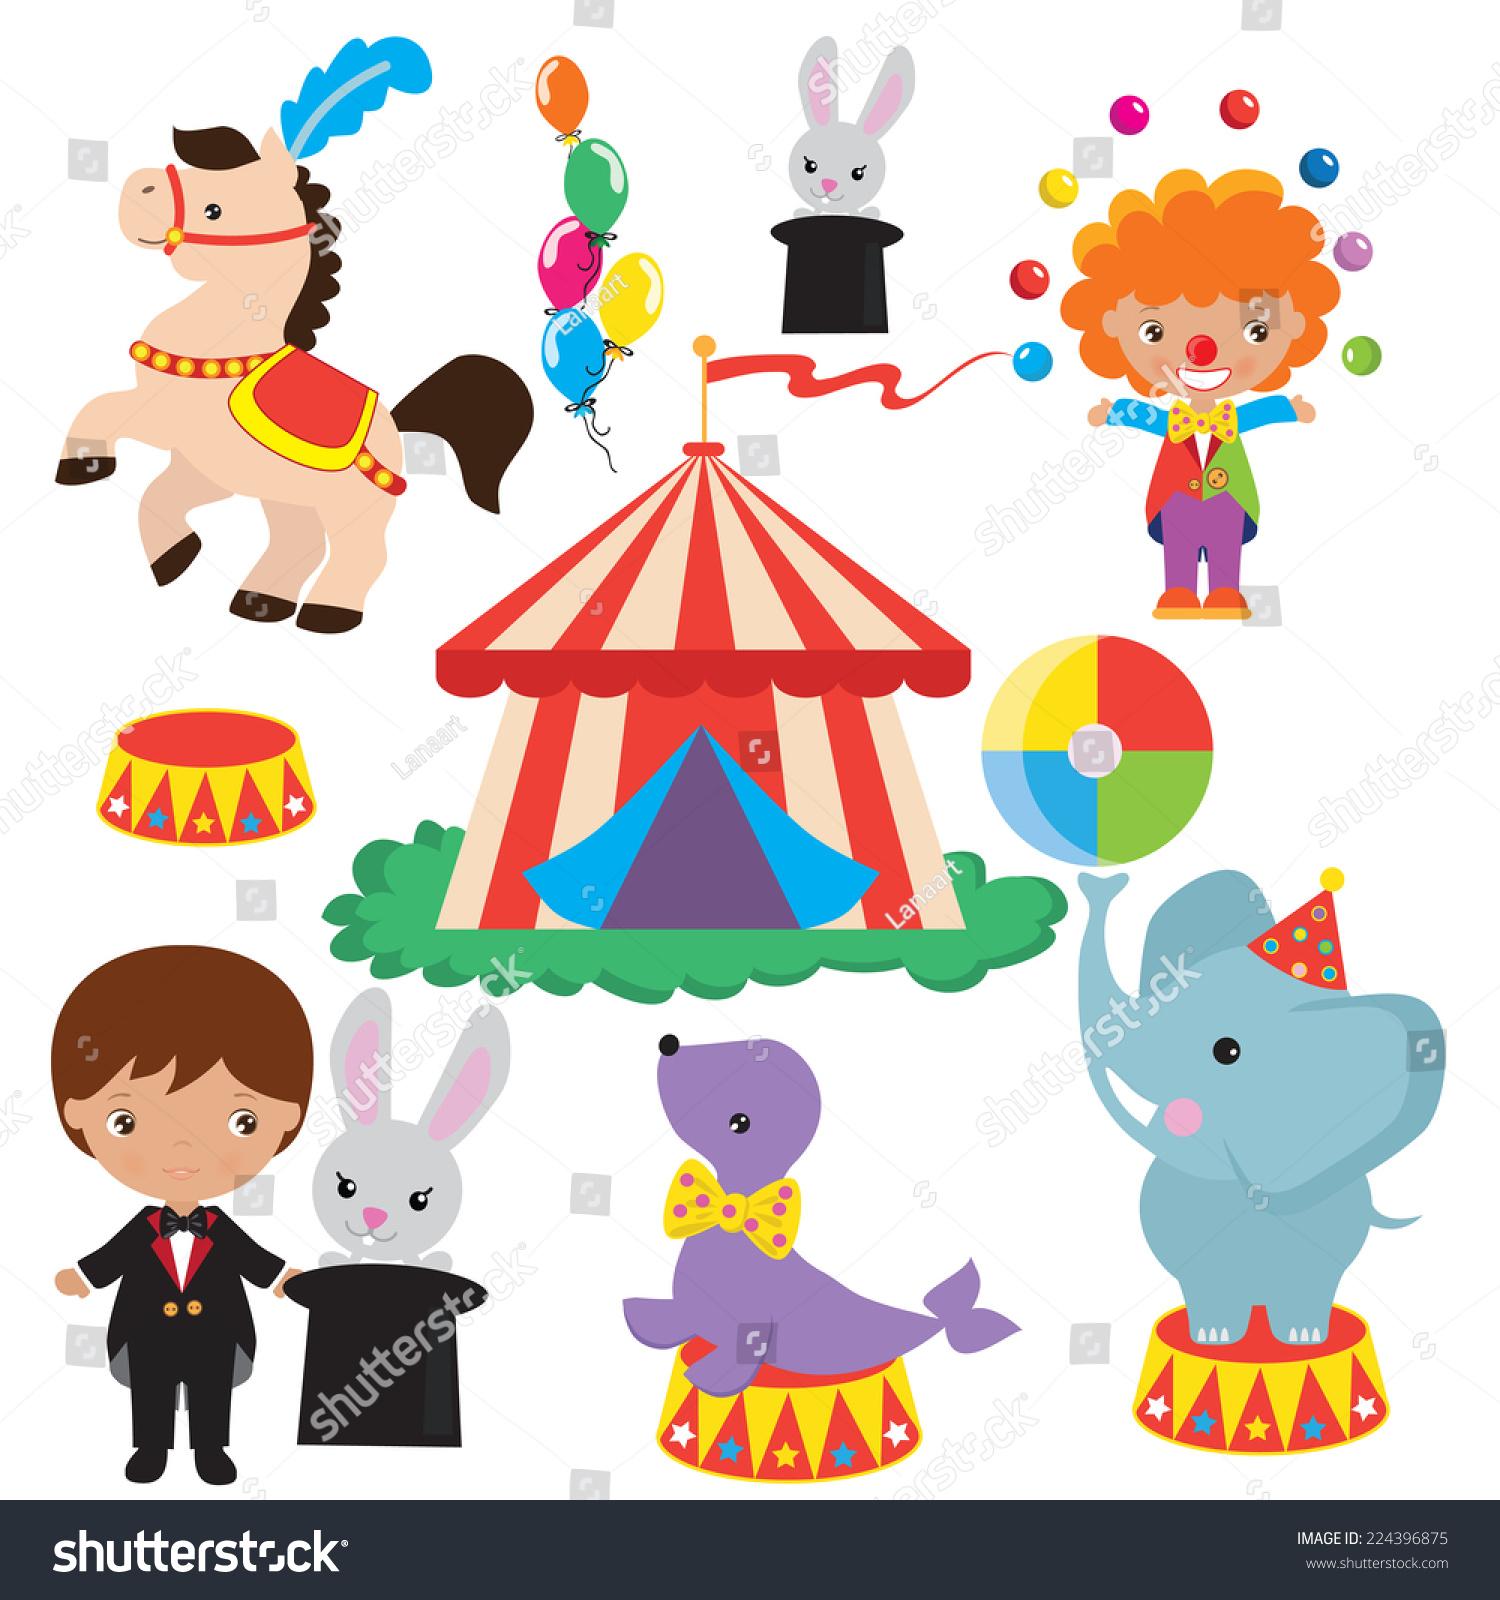 Royalty-free Circus vector illustration #224396875 Stock Photo ...